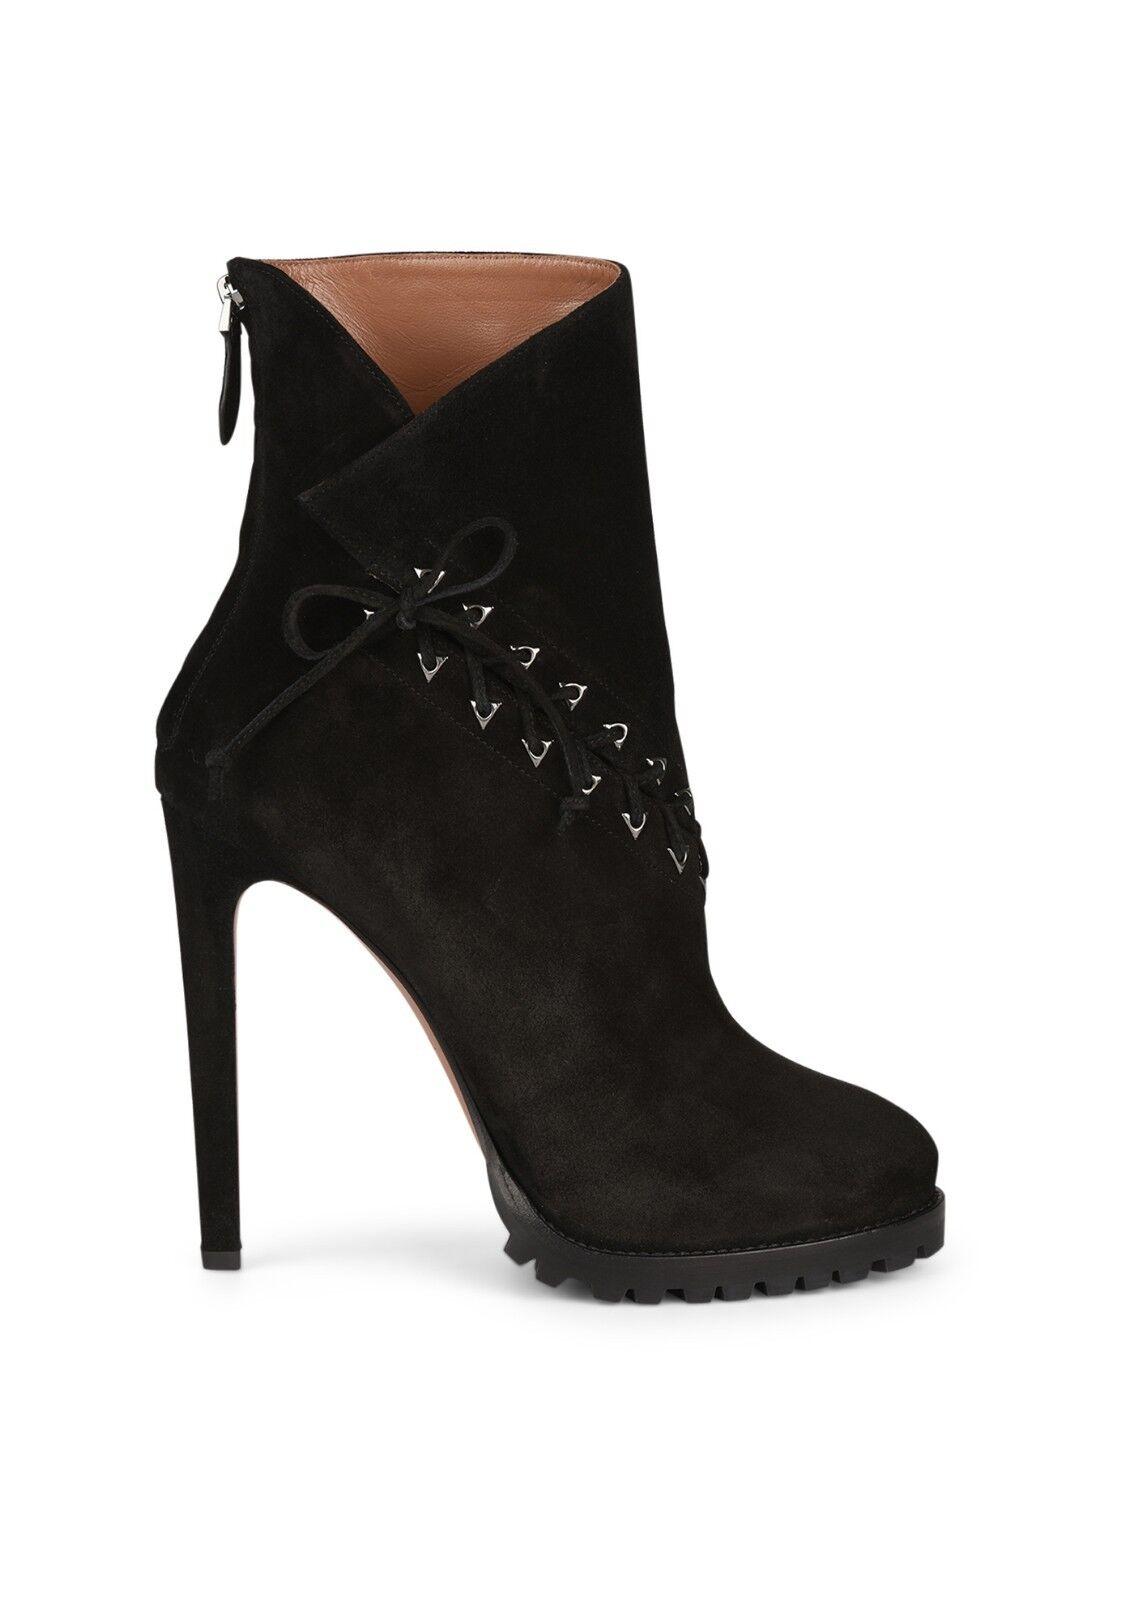 *** Azzedine Alaia Black Suede Platform Ankle Boots Size 40